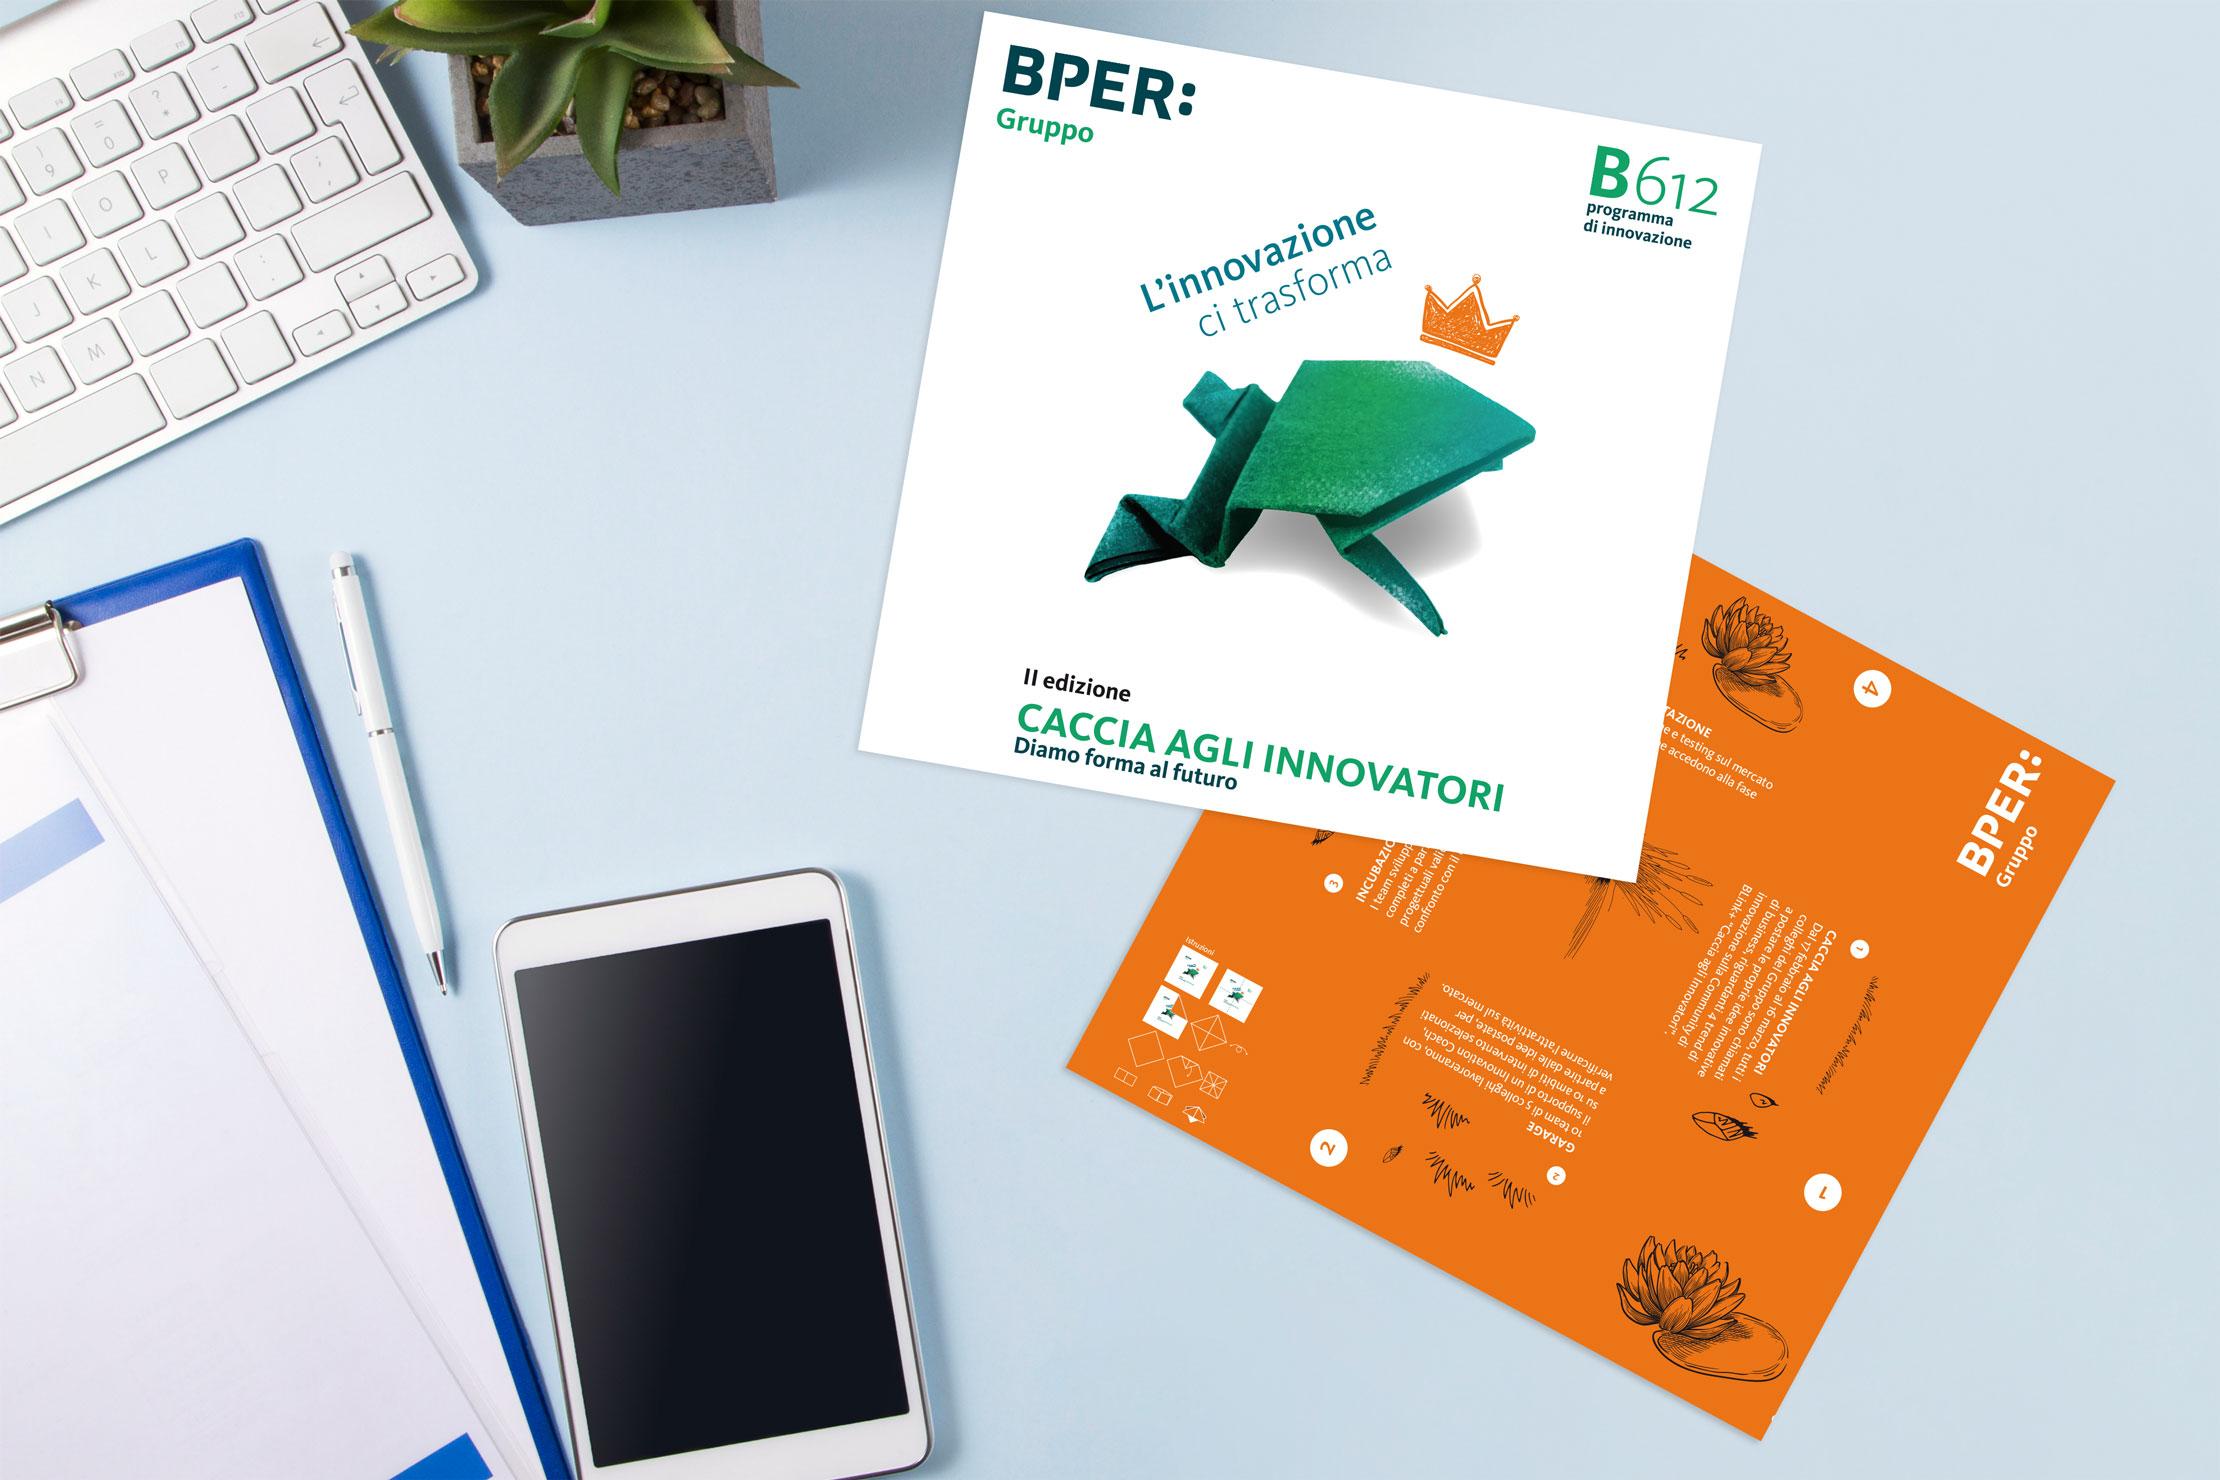 industree-gruppo-BPER-B612-engagement-12